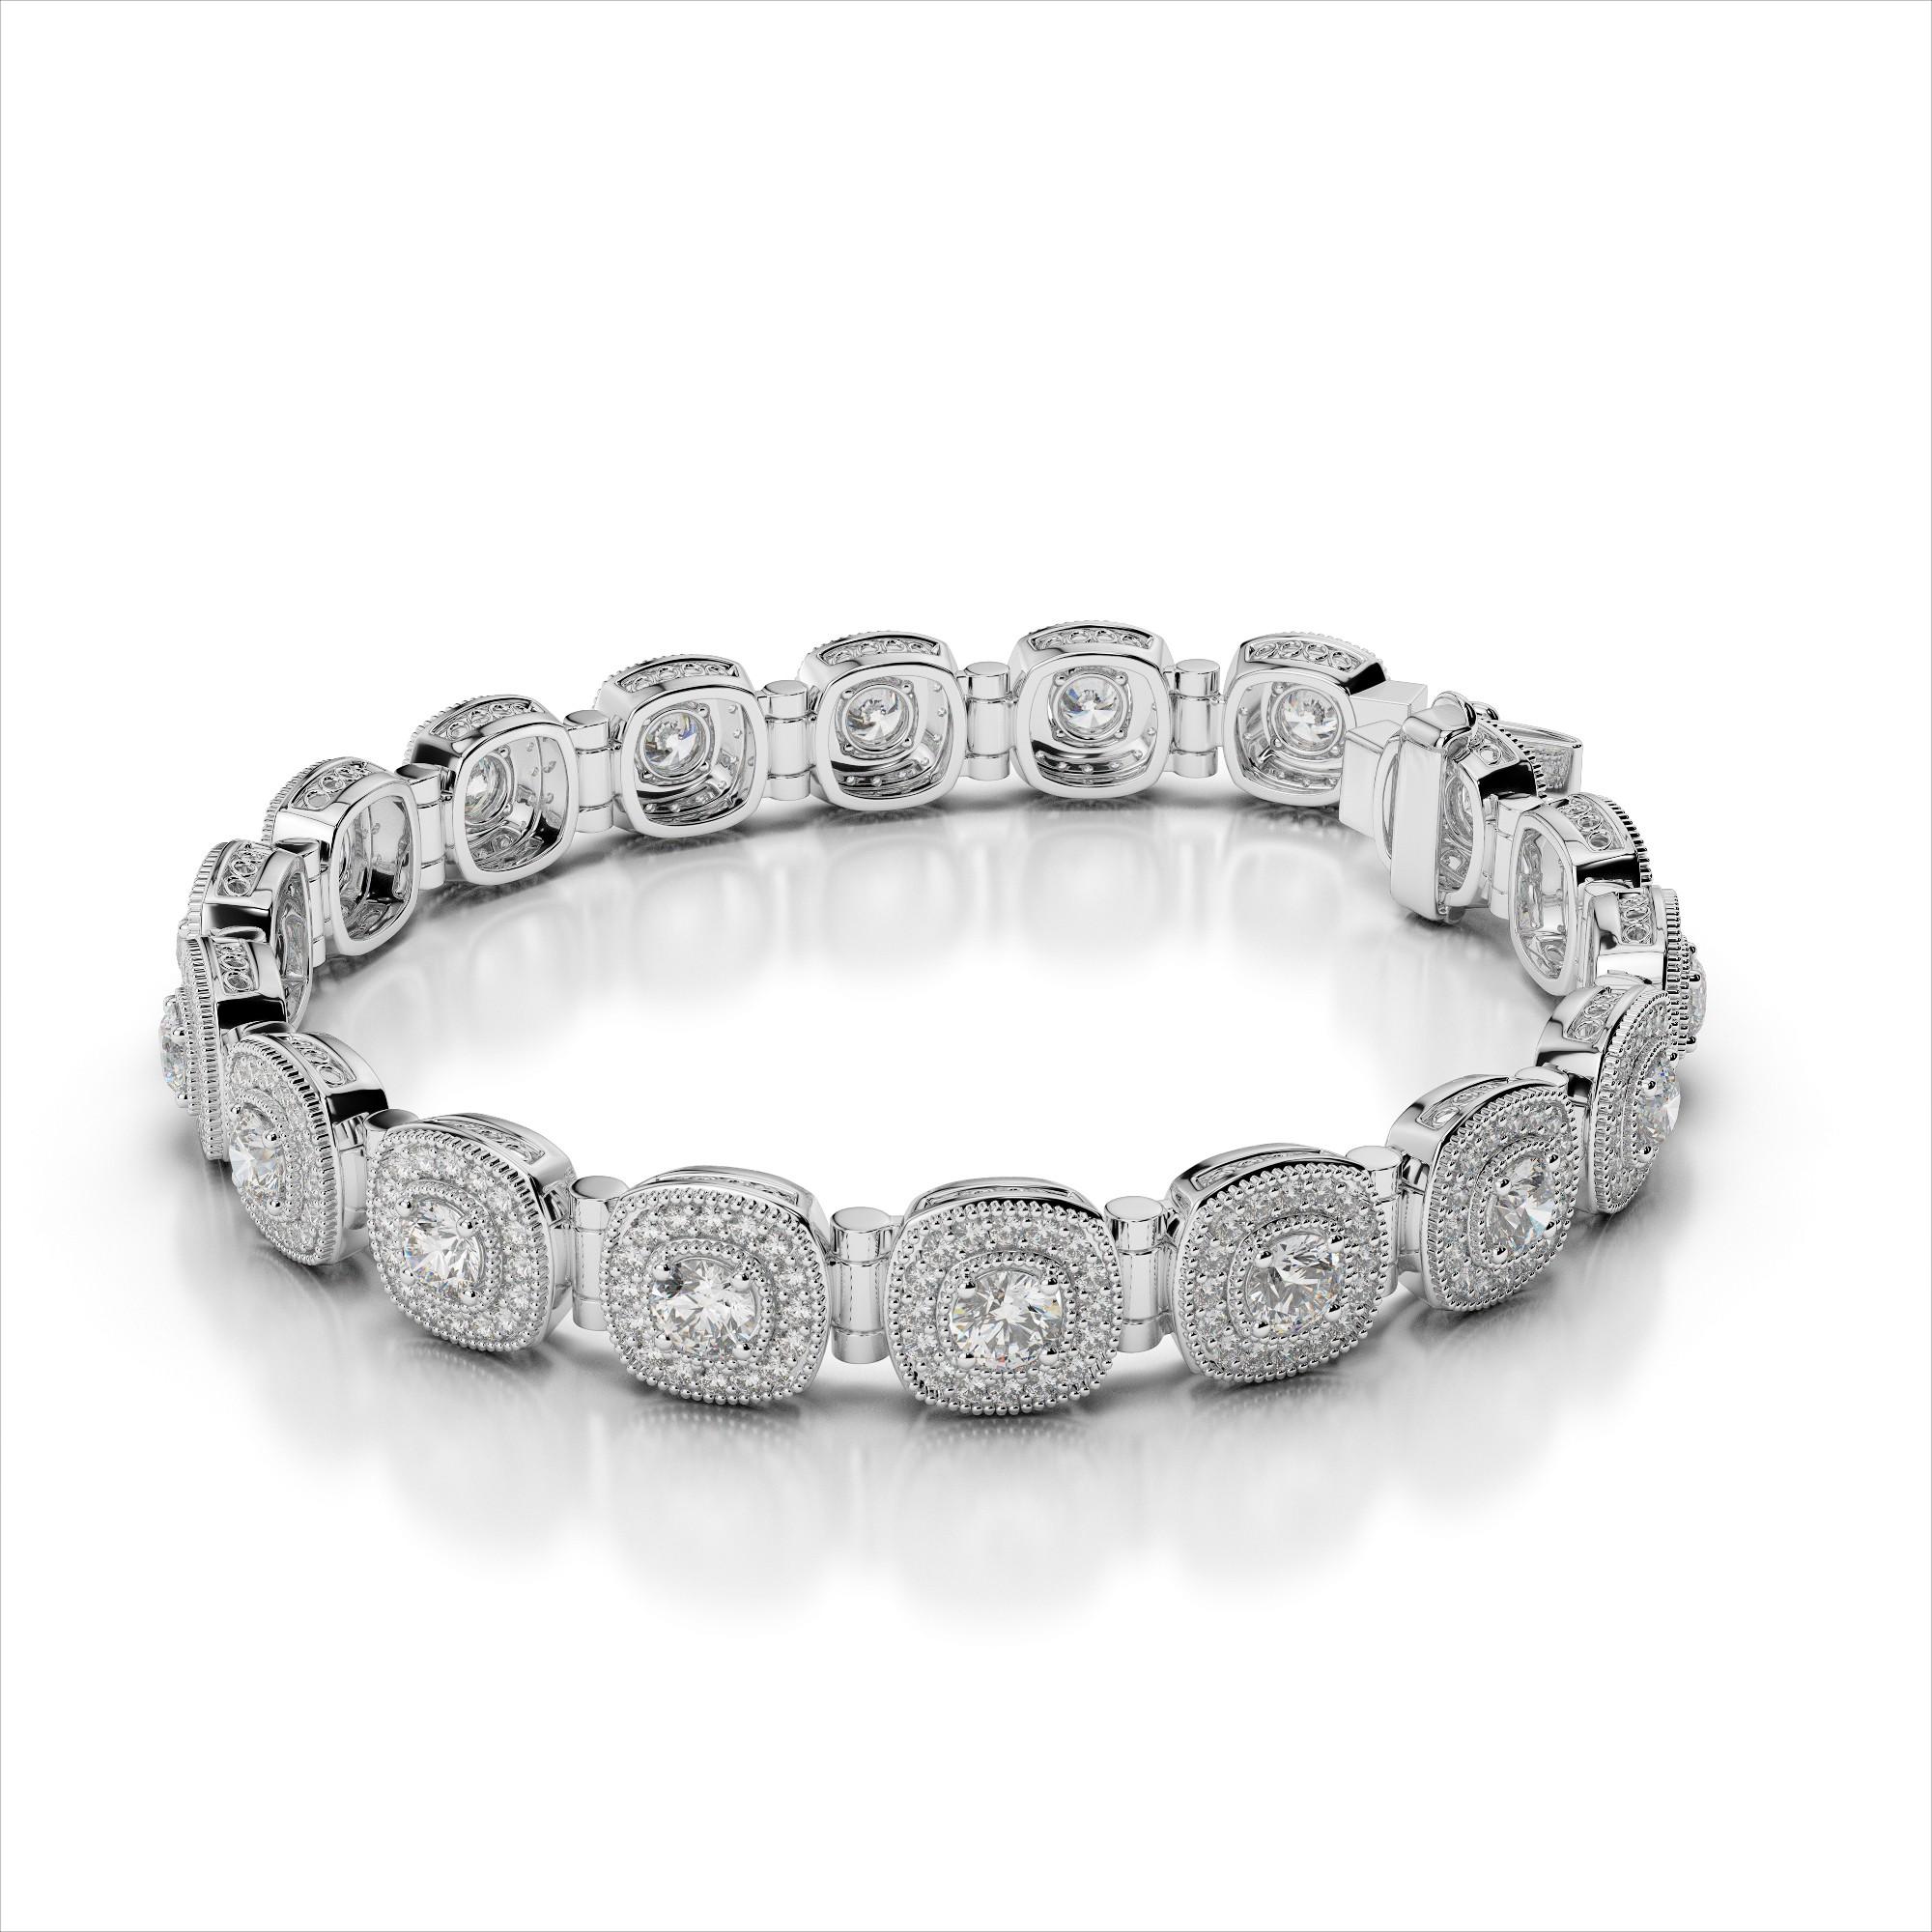 Diamond Halo Bracelet with Tube Links